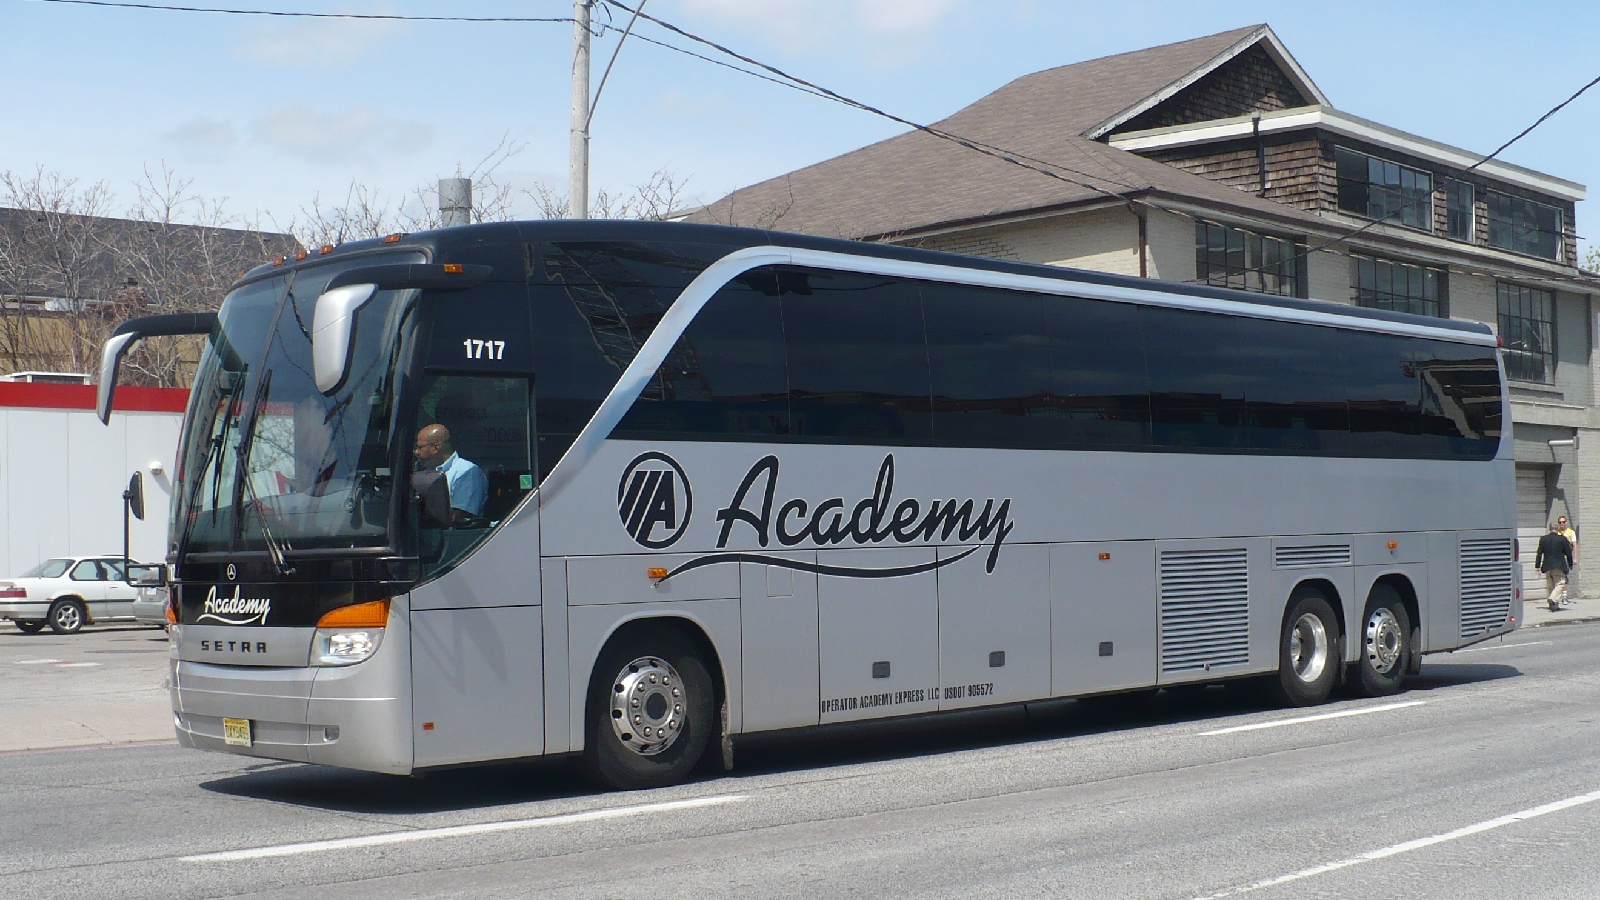 lucky streak bus company